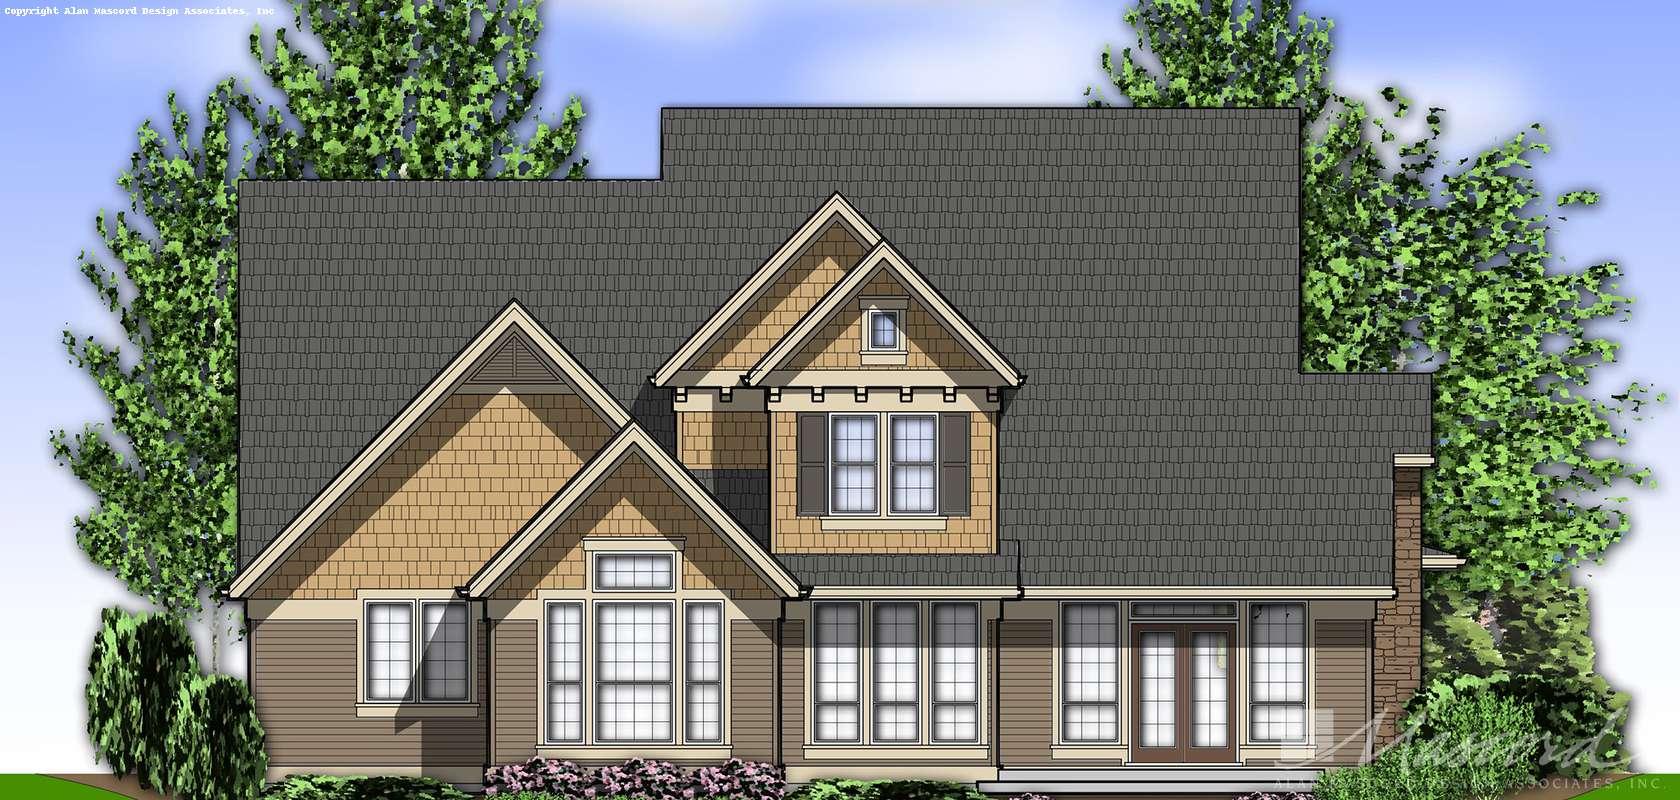 Mascord House Plan 22122Q: The Northbrook